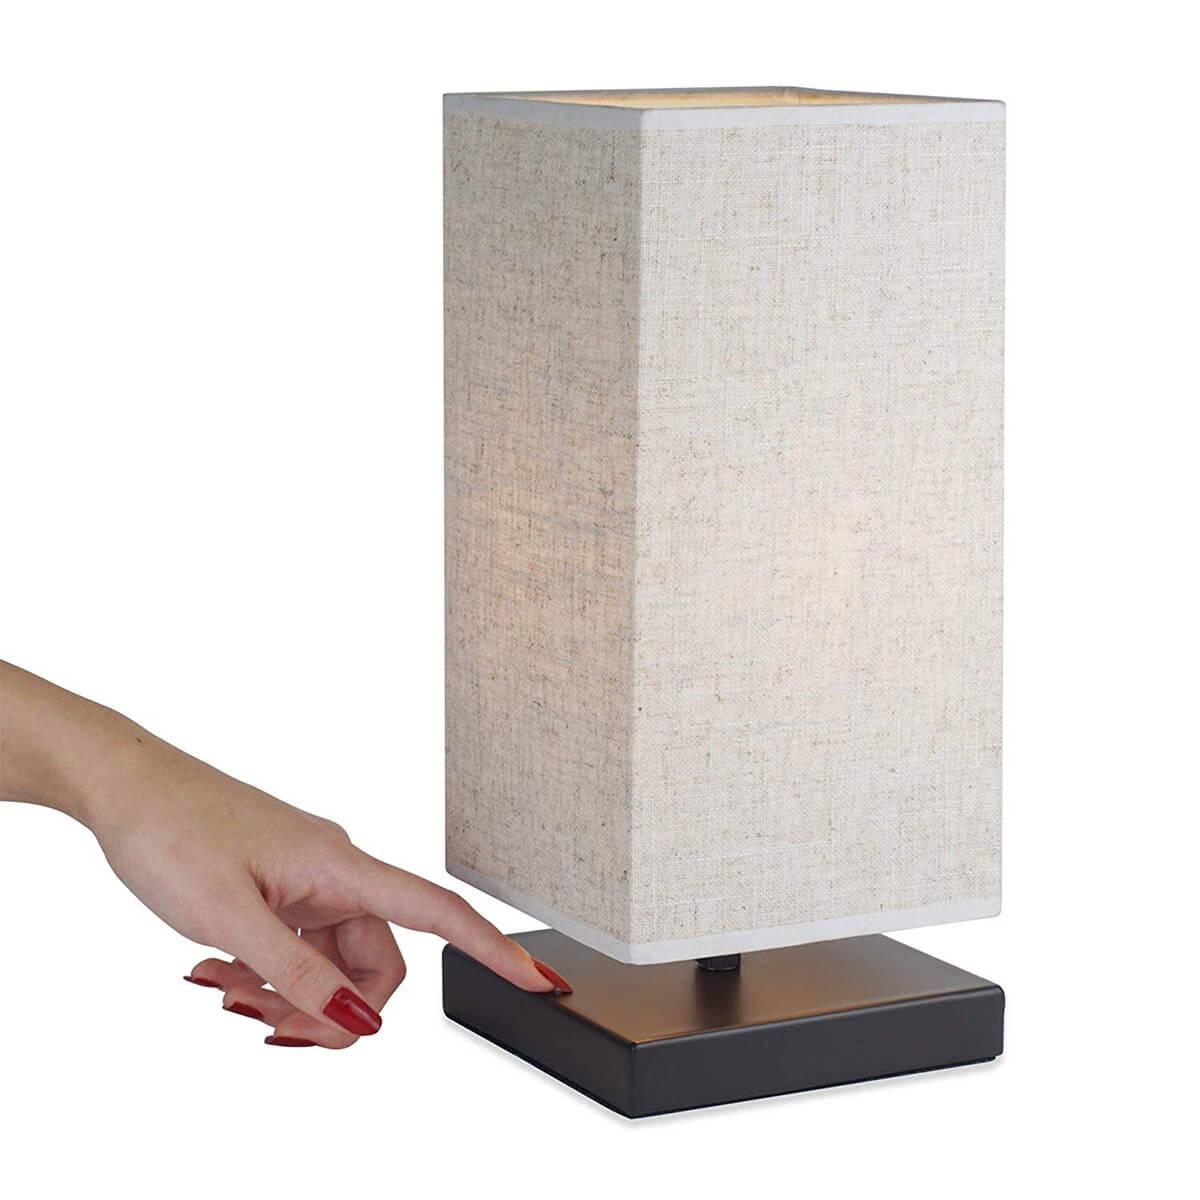 Прикроватная лампа фото 4